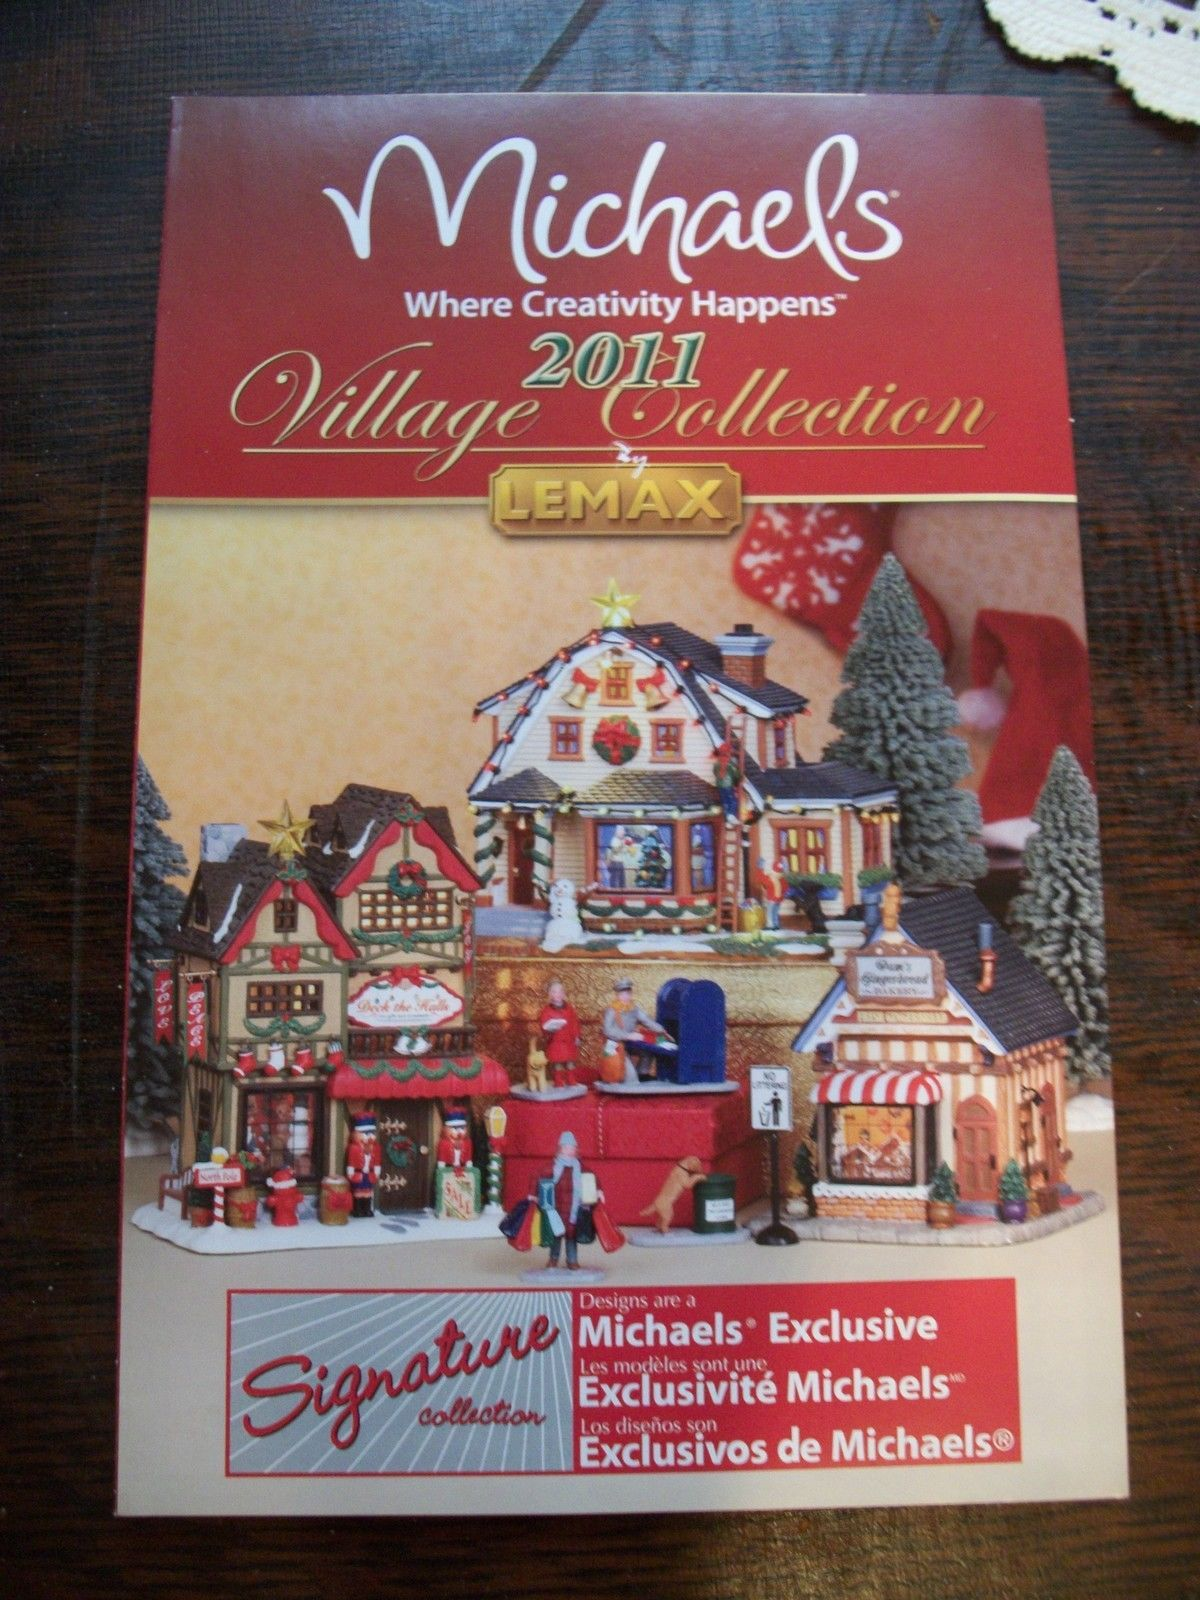 Lemax Michaels Christmas Village 2011 Product Brochure Catalog ...